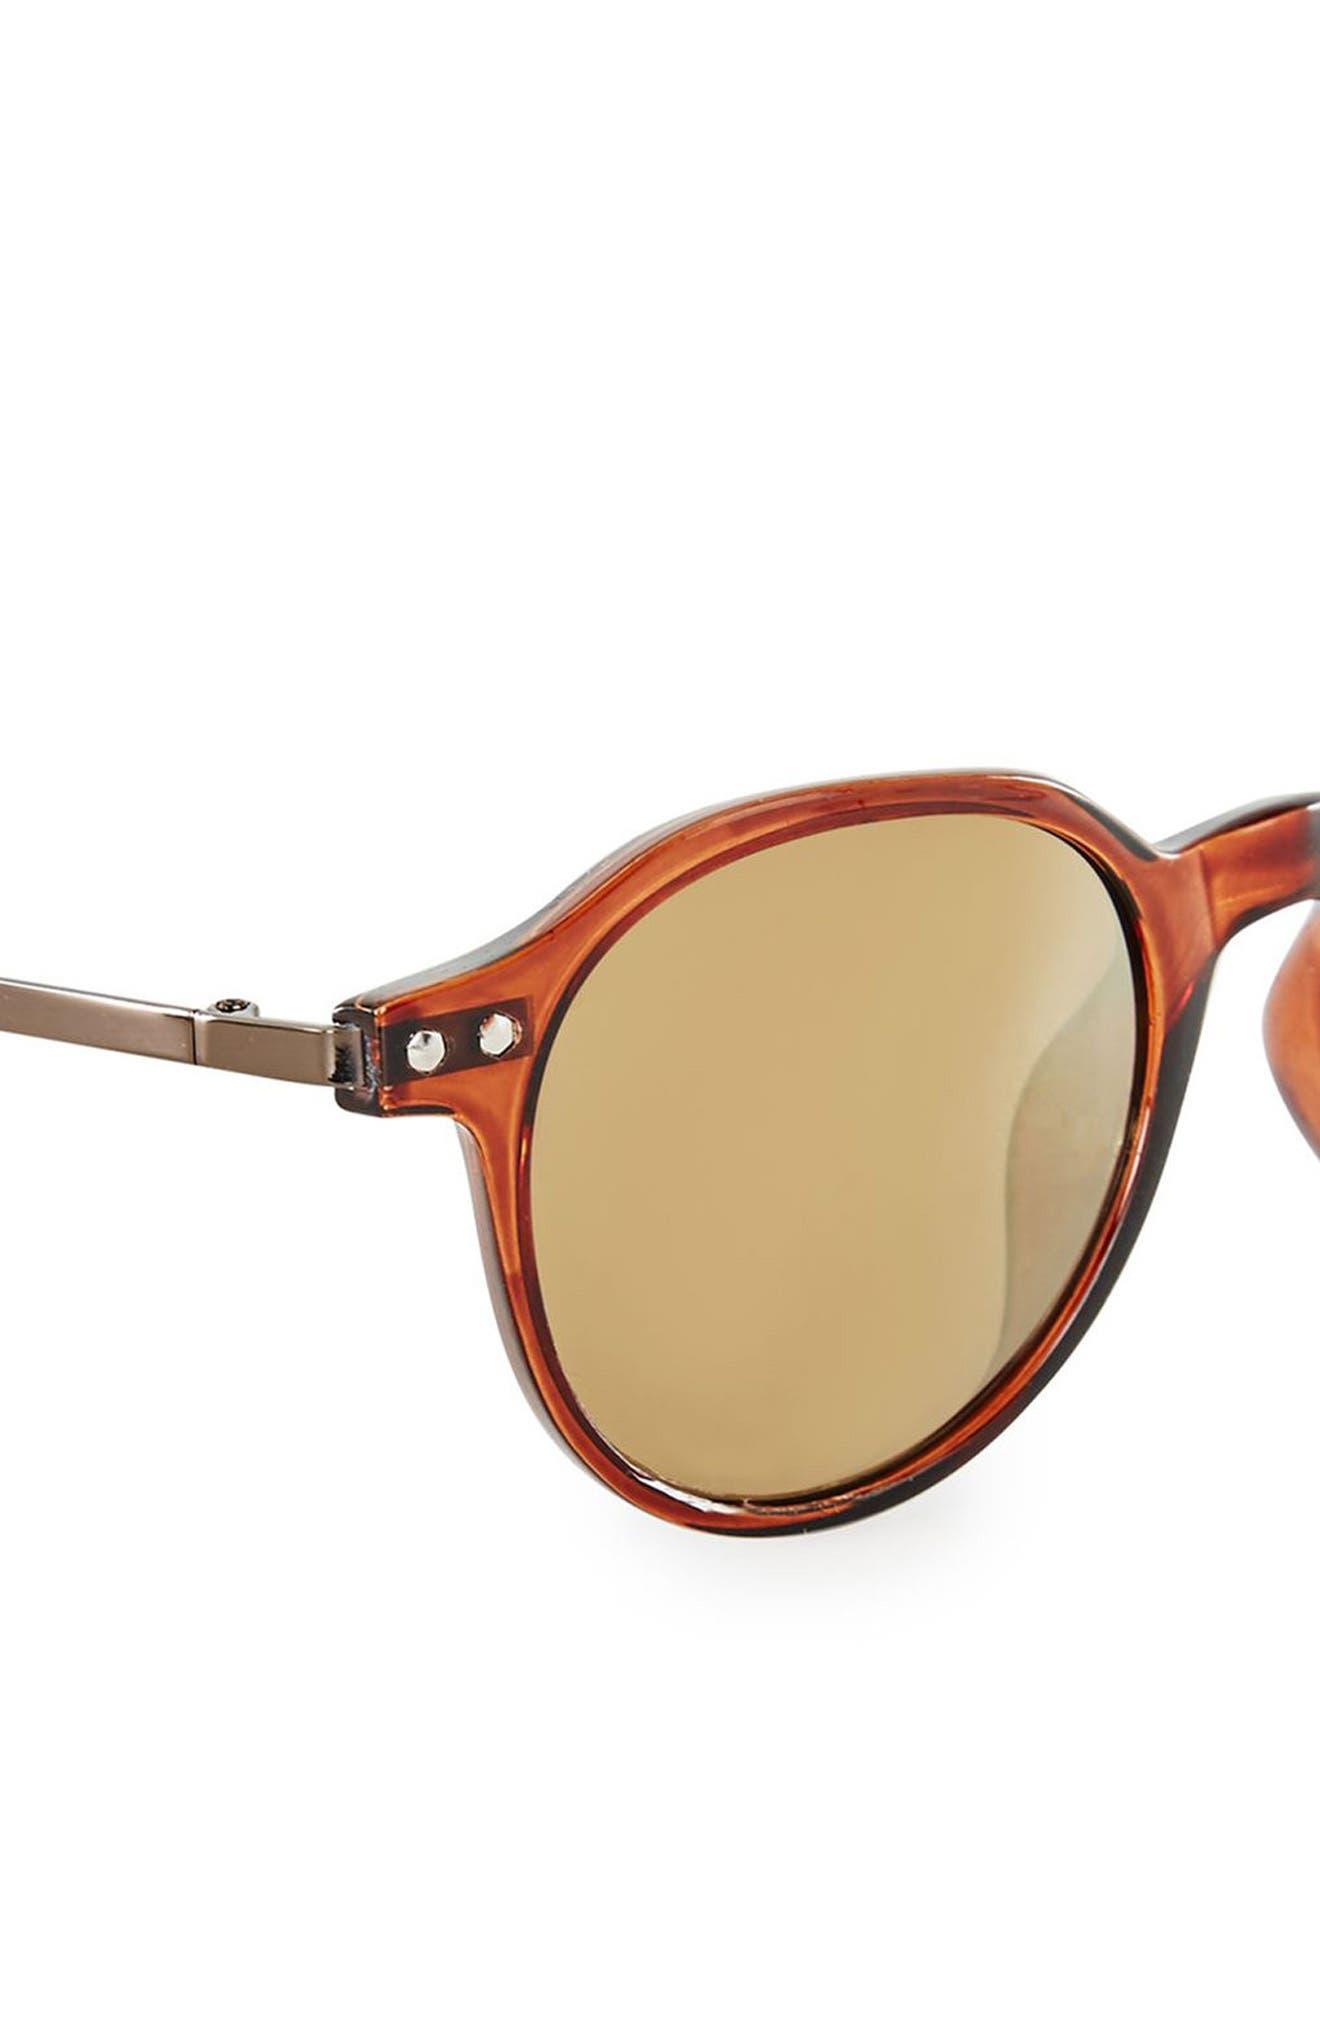 45mm Round Sunglasses,                             Alternate thumbnail 2, color,                             200